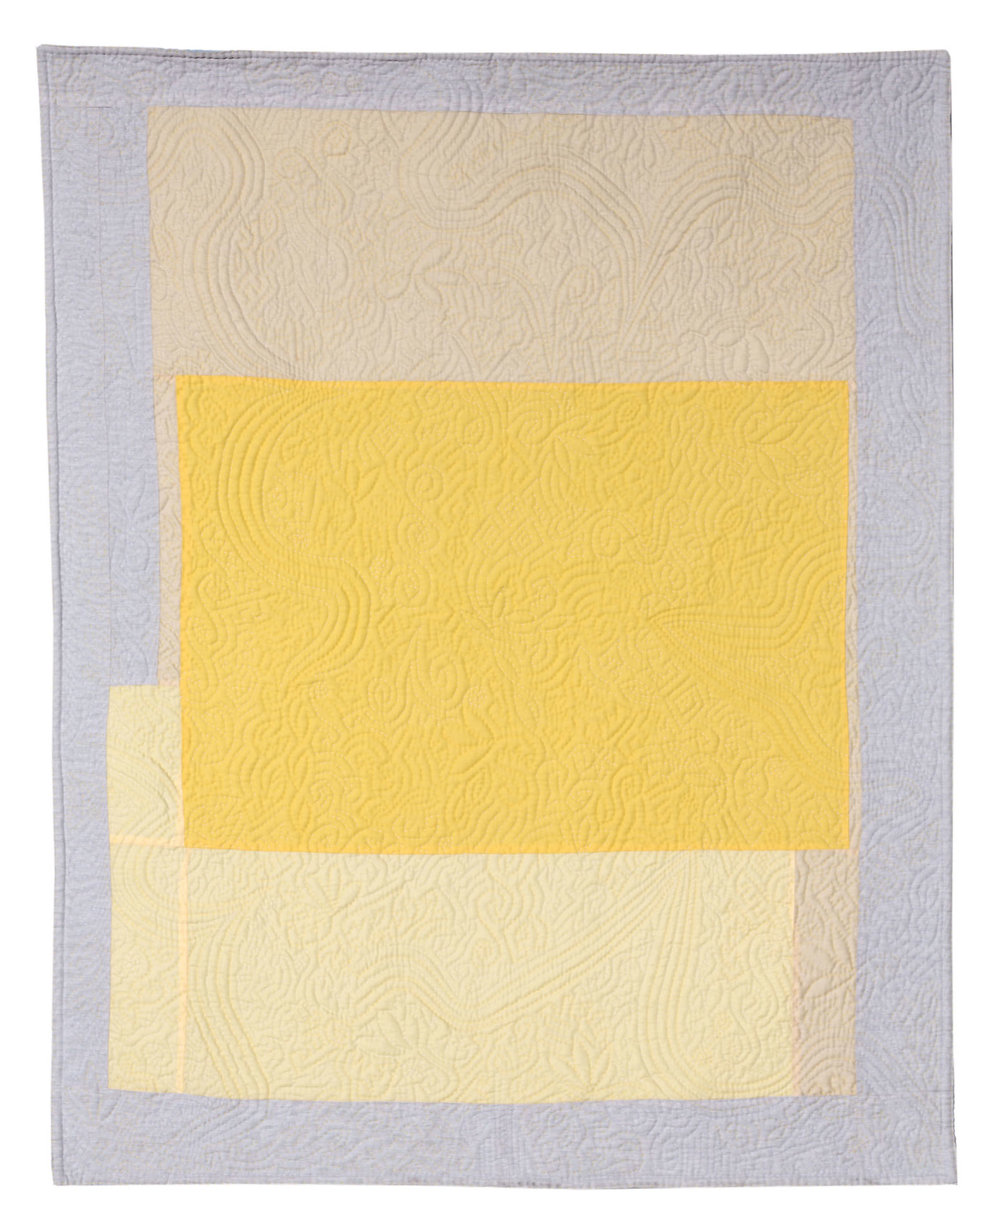 Bosna_Quilts_yellow_grey_RGB.jpg